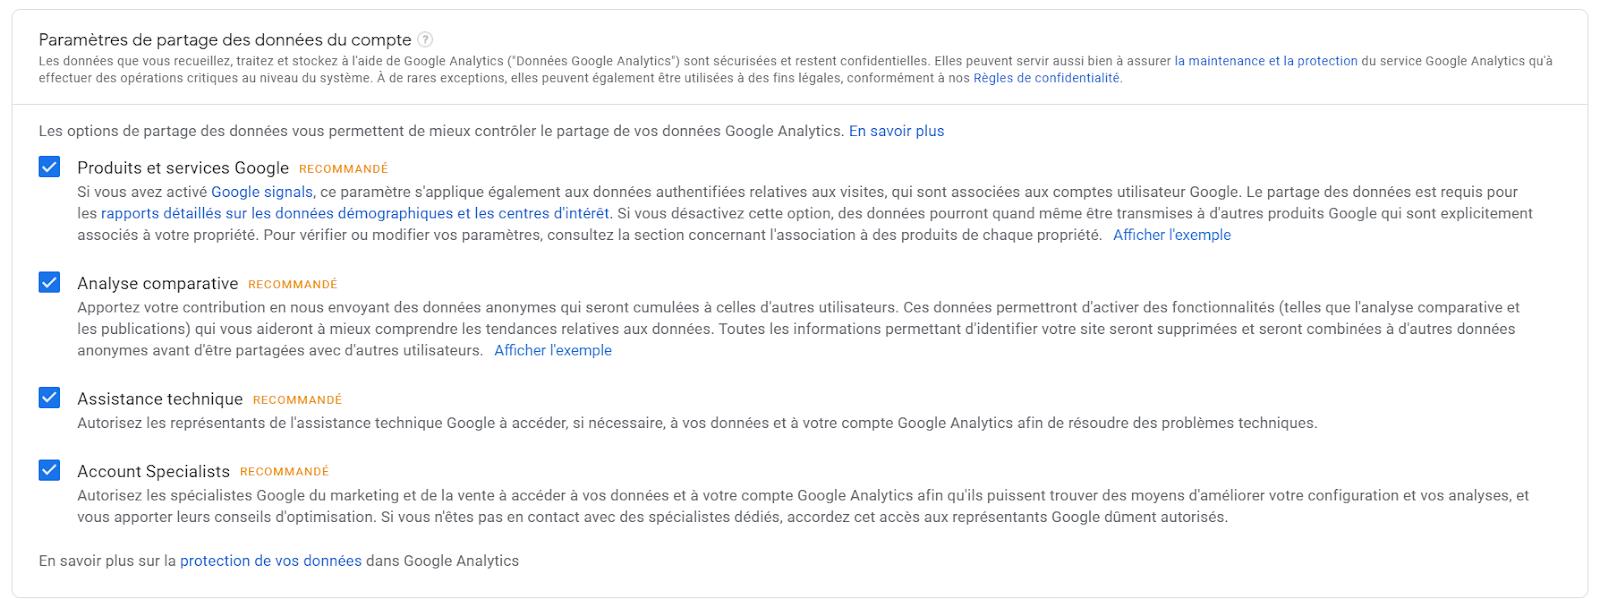 parametres google analytics